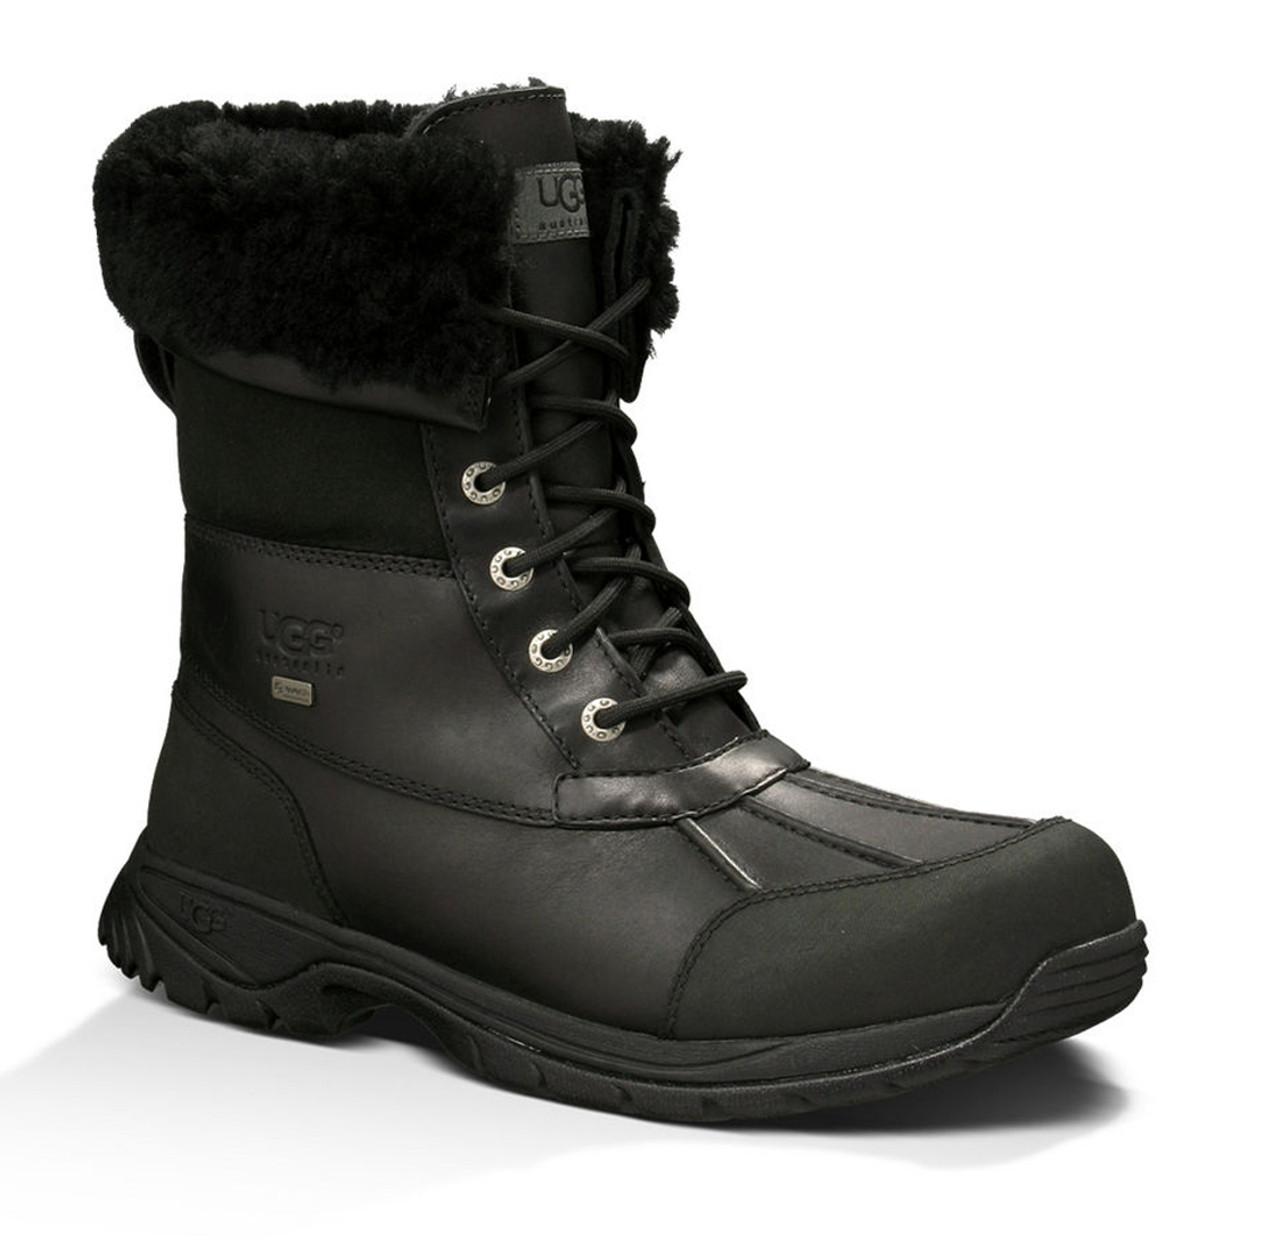 a5982b09313 UGG Men's Butte Waterproof Winter Boots Black